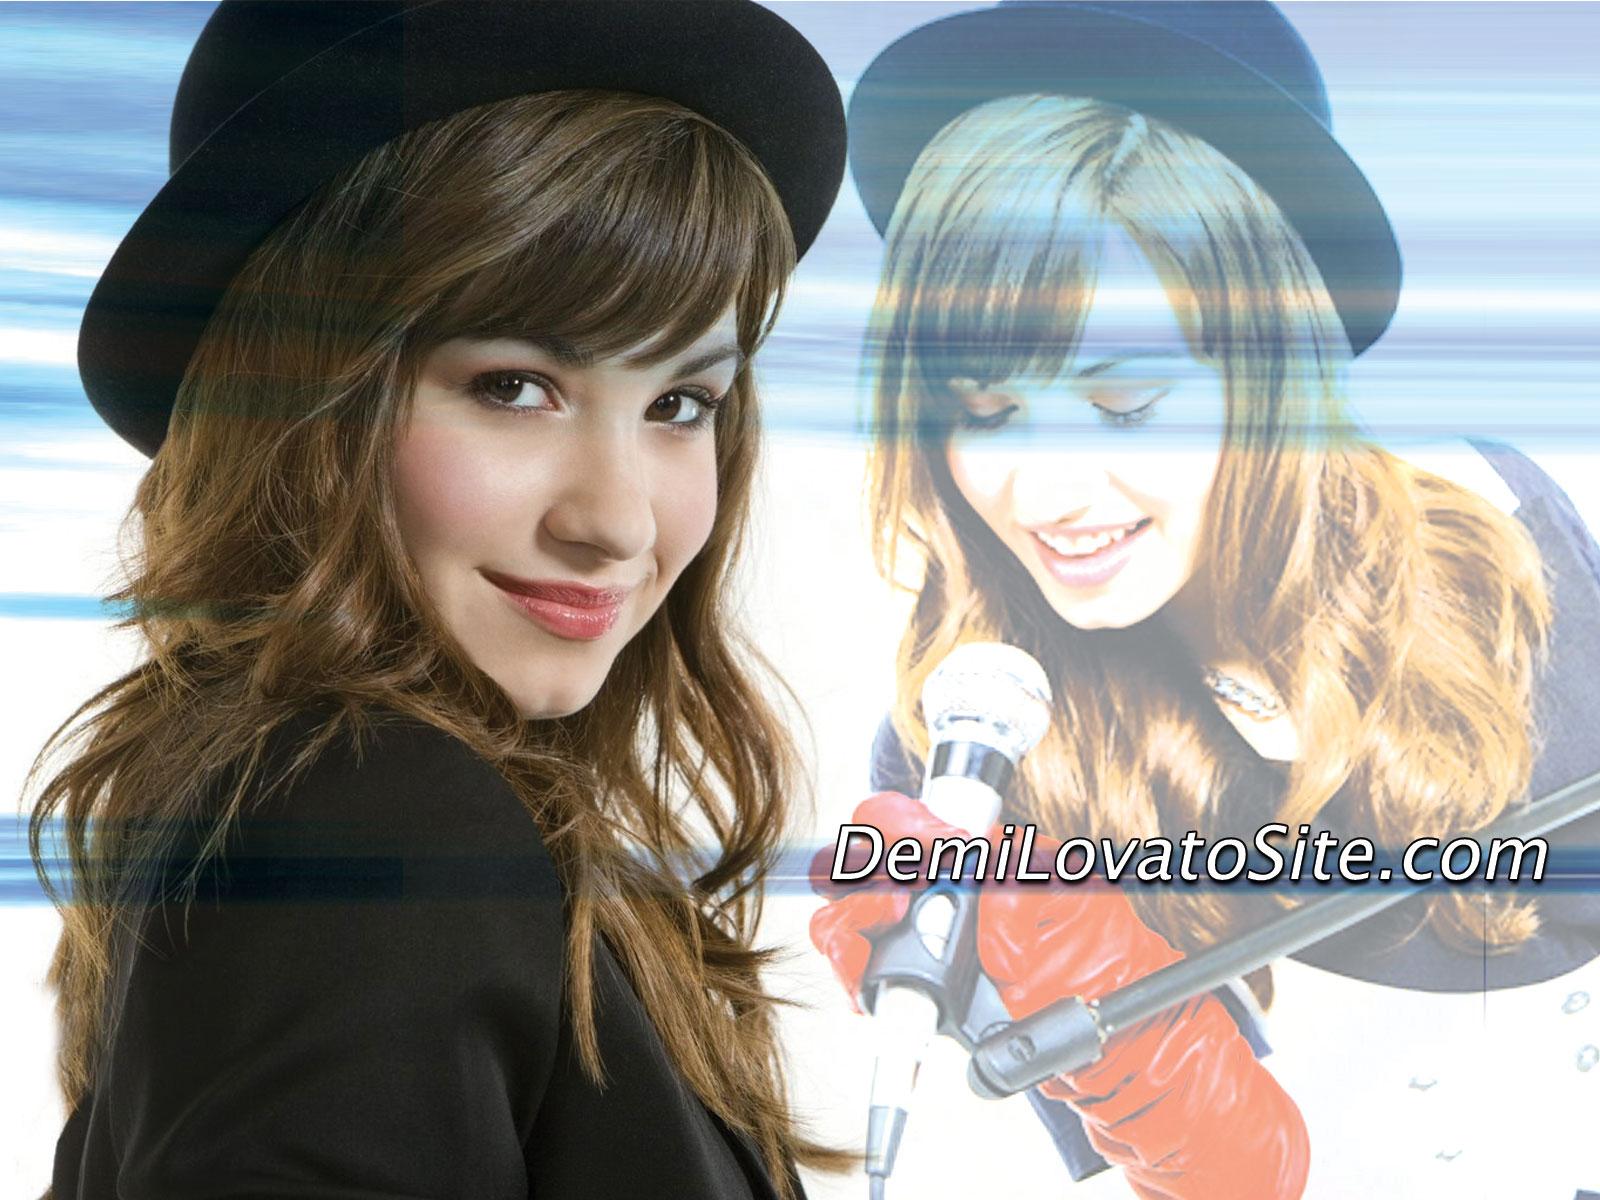 http://2.bp.blogspot.com/-kG-_gKfCaRg/TwEqbuL8_II/AAAAAAAADSY/a0Z7qD6QFrA/s1600/Demi+-Lovato+_wallpaper_Demi+-Lovato+_fotos_papel_de_parede_Demi+-Lovato+%25285%2529.jpg